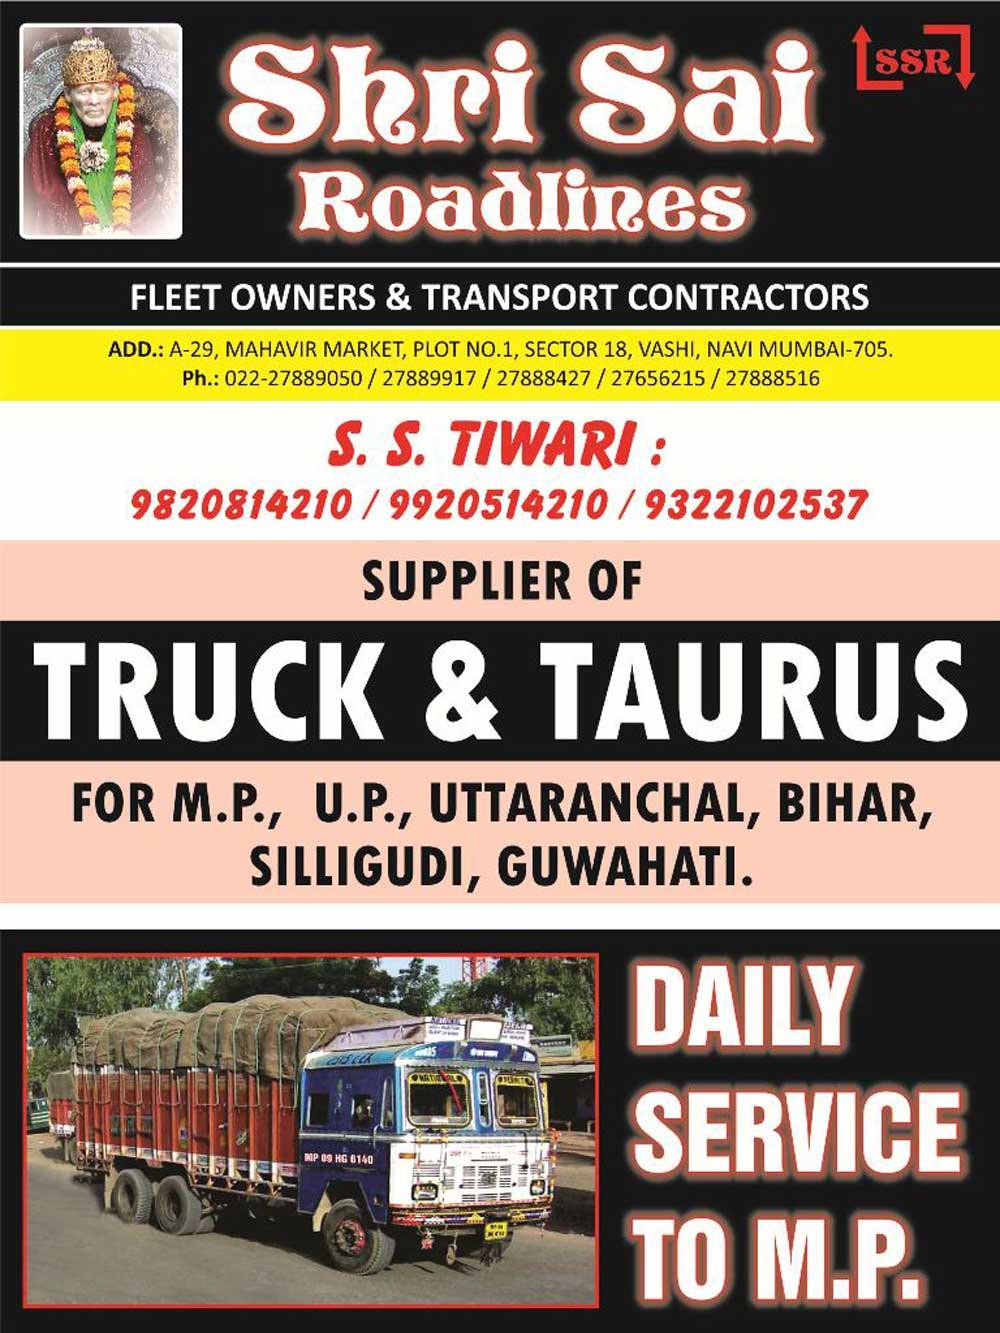 Shri Sai Roadlines